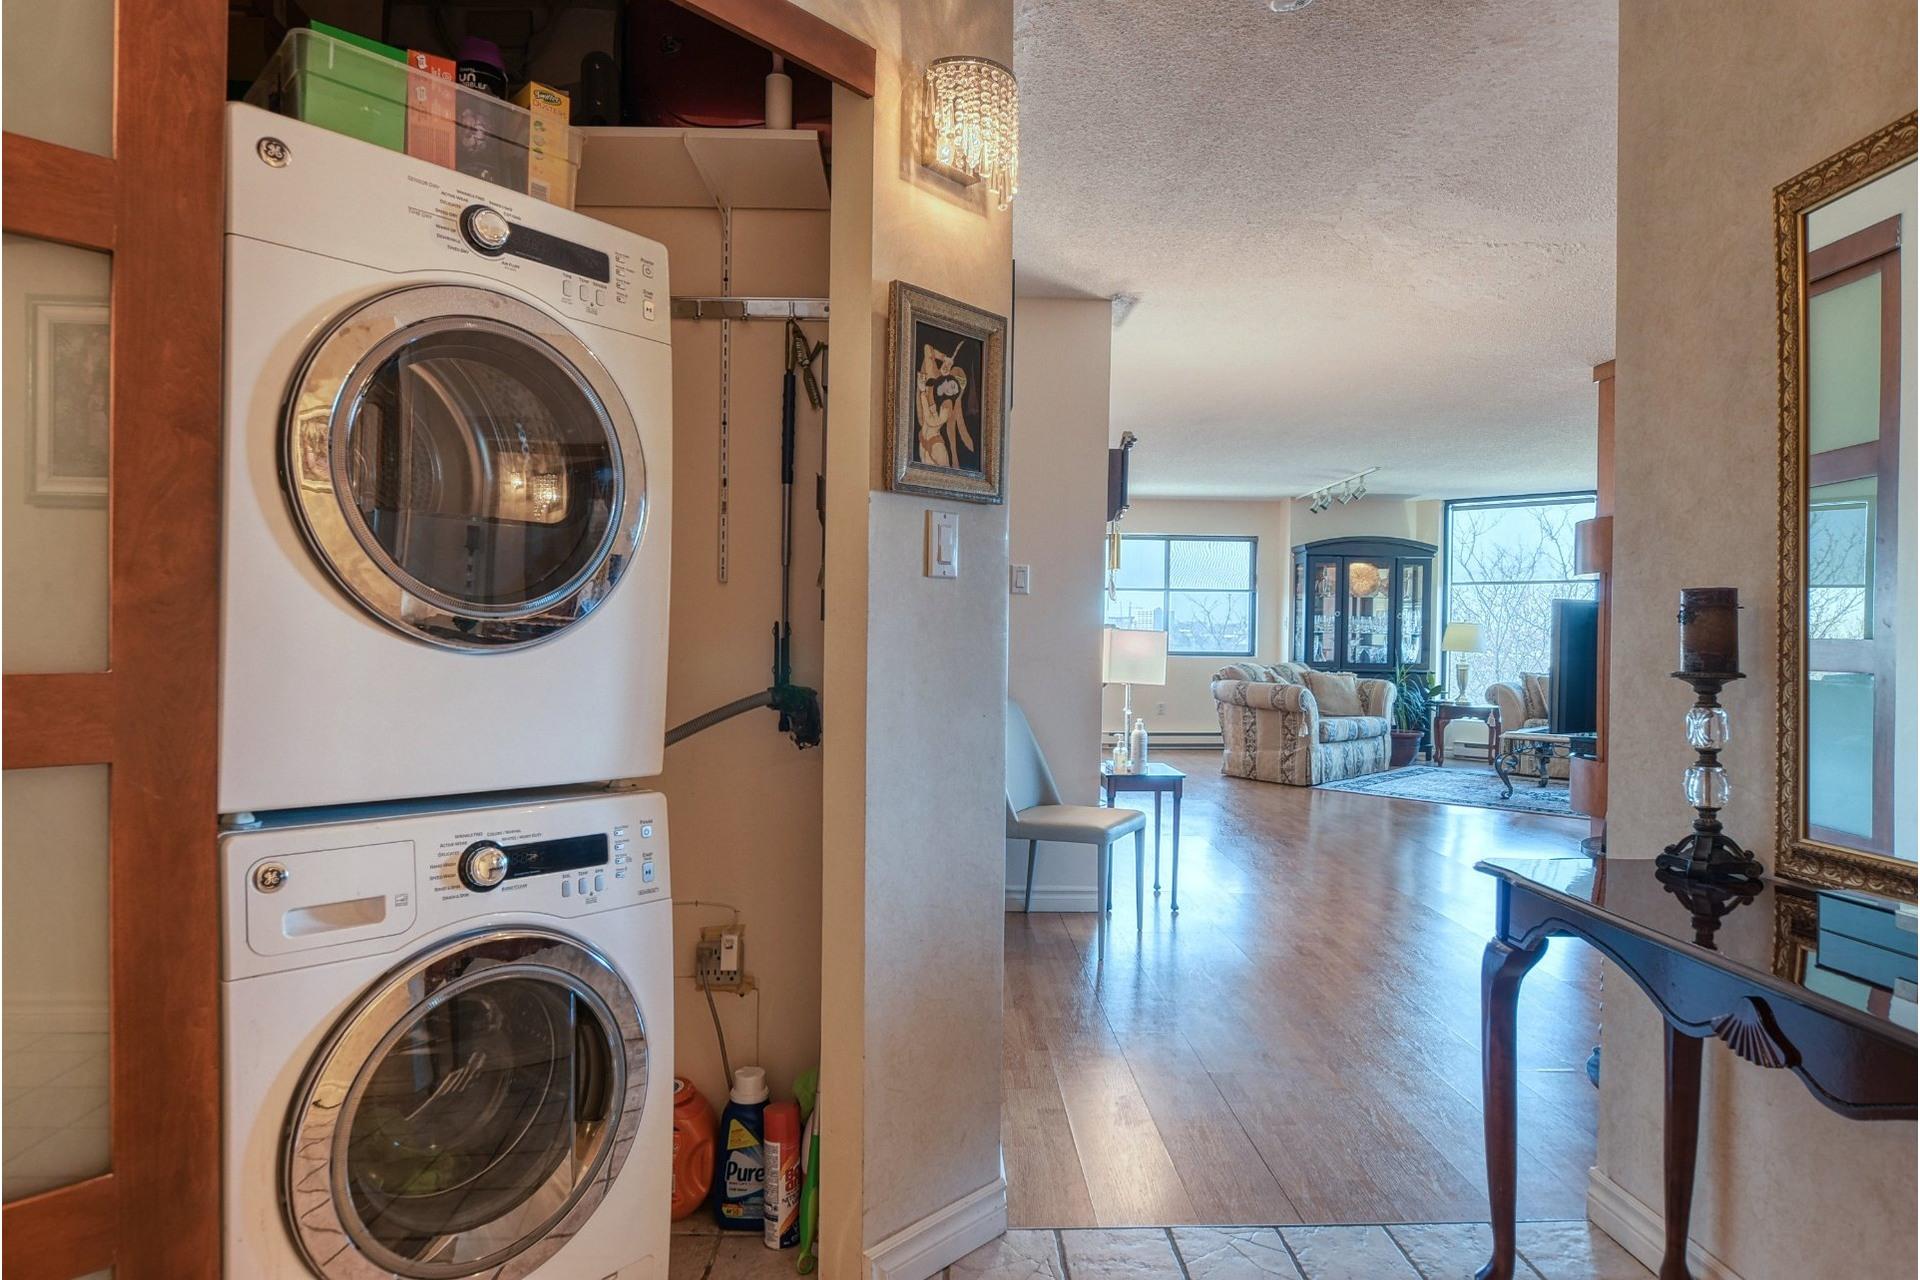 image 19 - Apartment For sale Le Vieux-Longueuil Longueuil  - 6 rooms